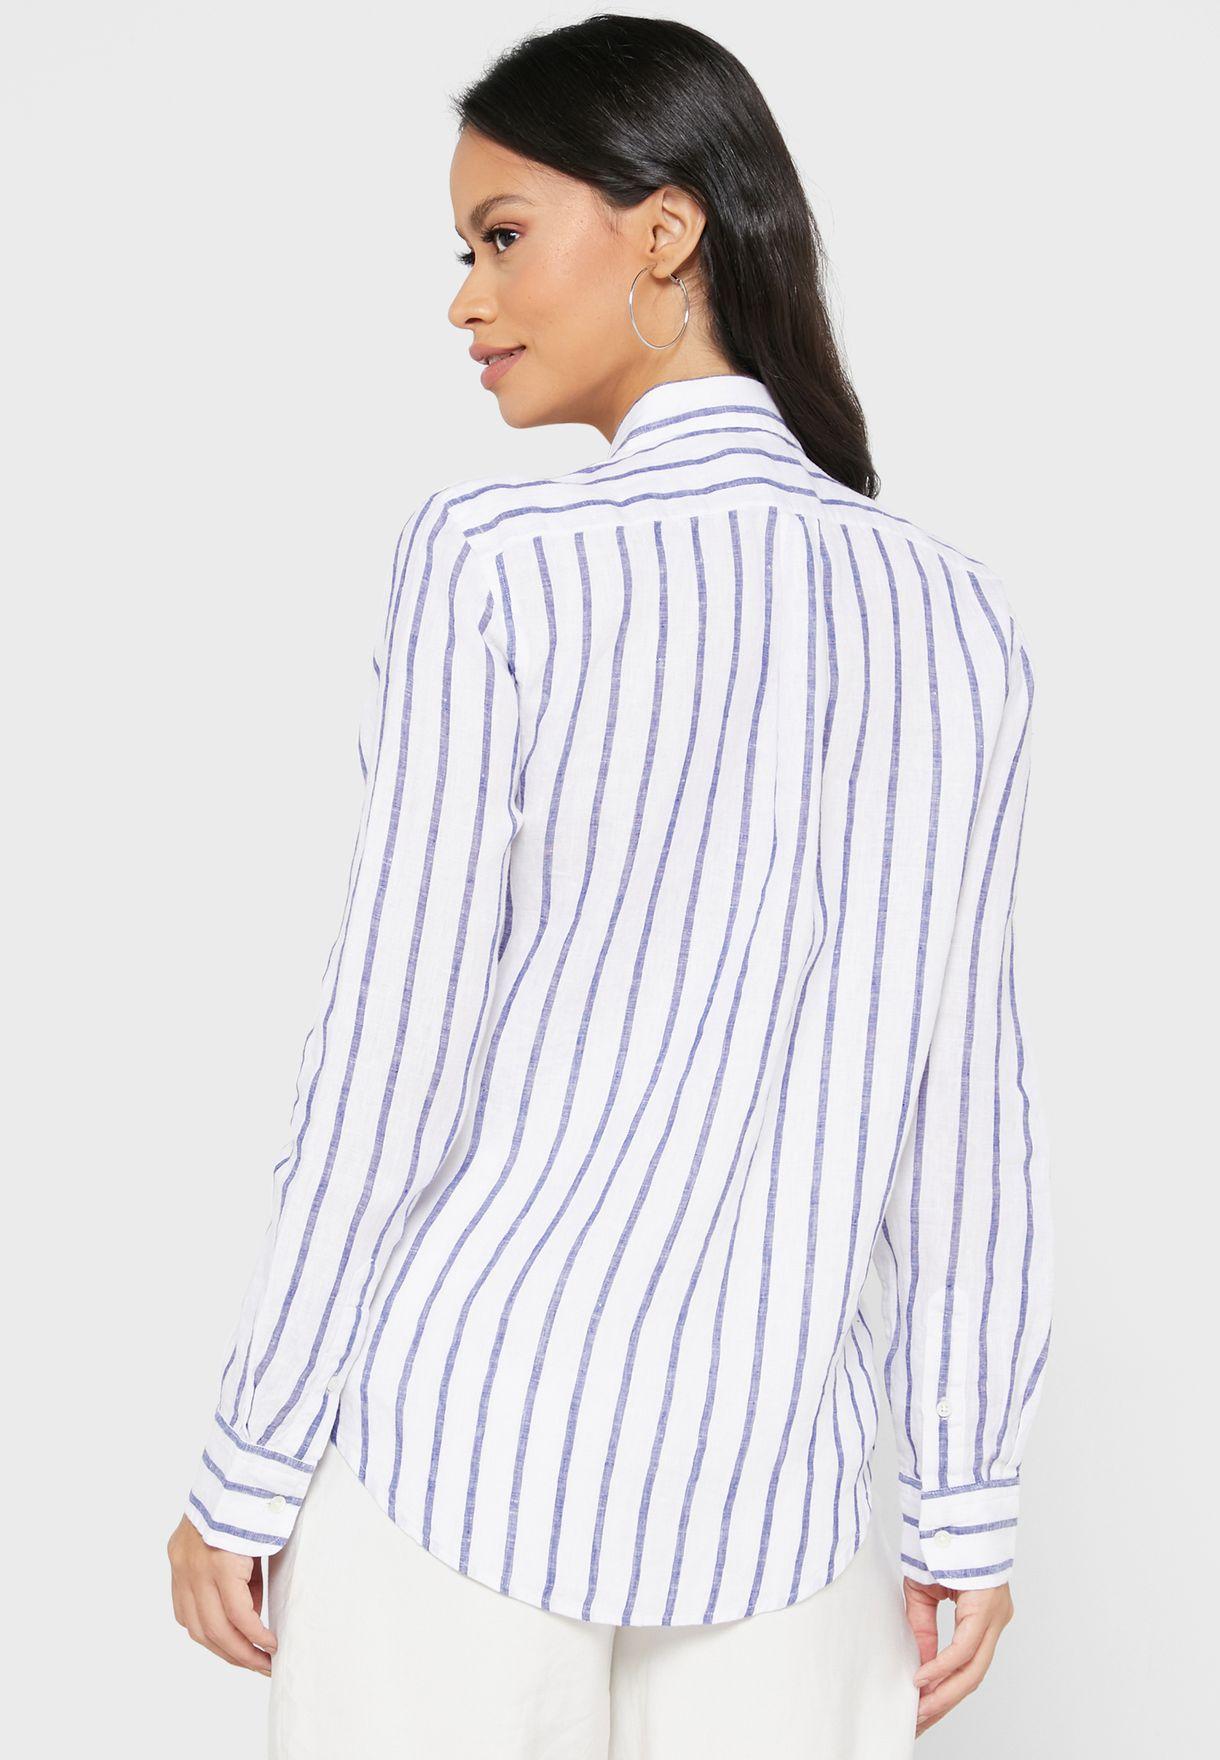 Logo Striped Shirt